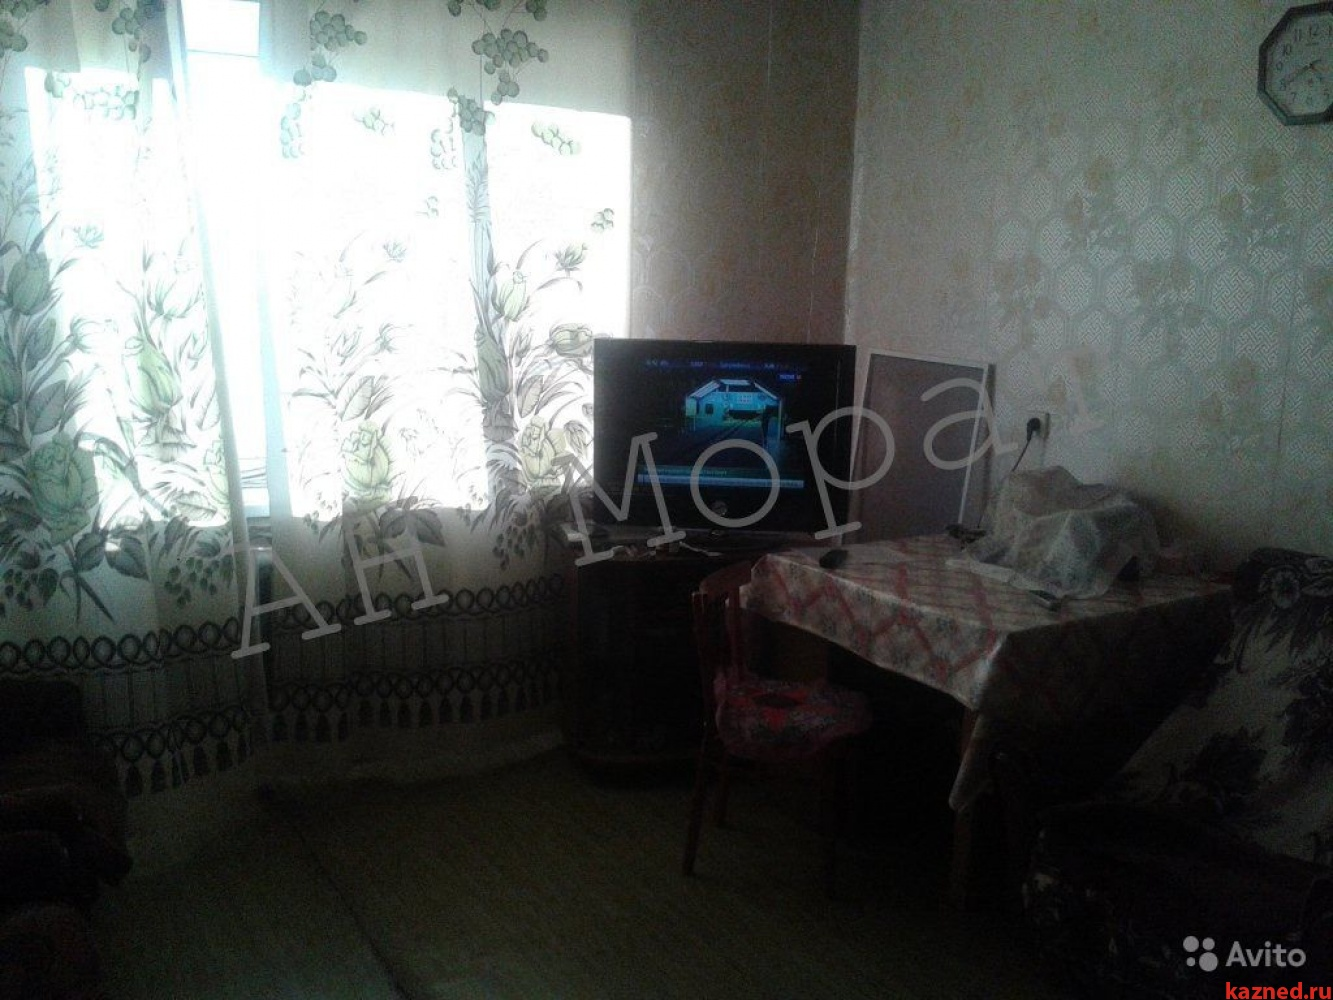 Продажа 1-к квартиры Дубинина, д. 7, 37 м2  (миниатюра №9)